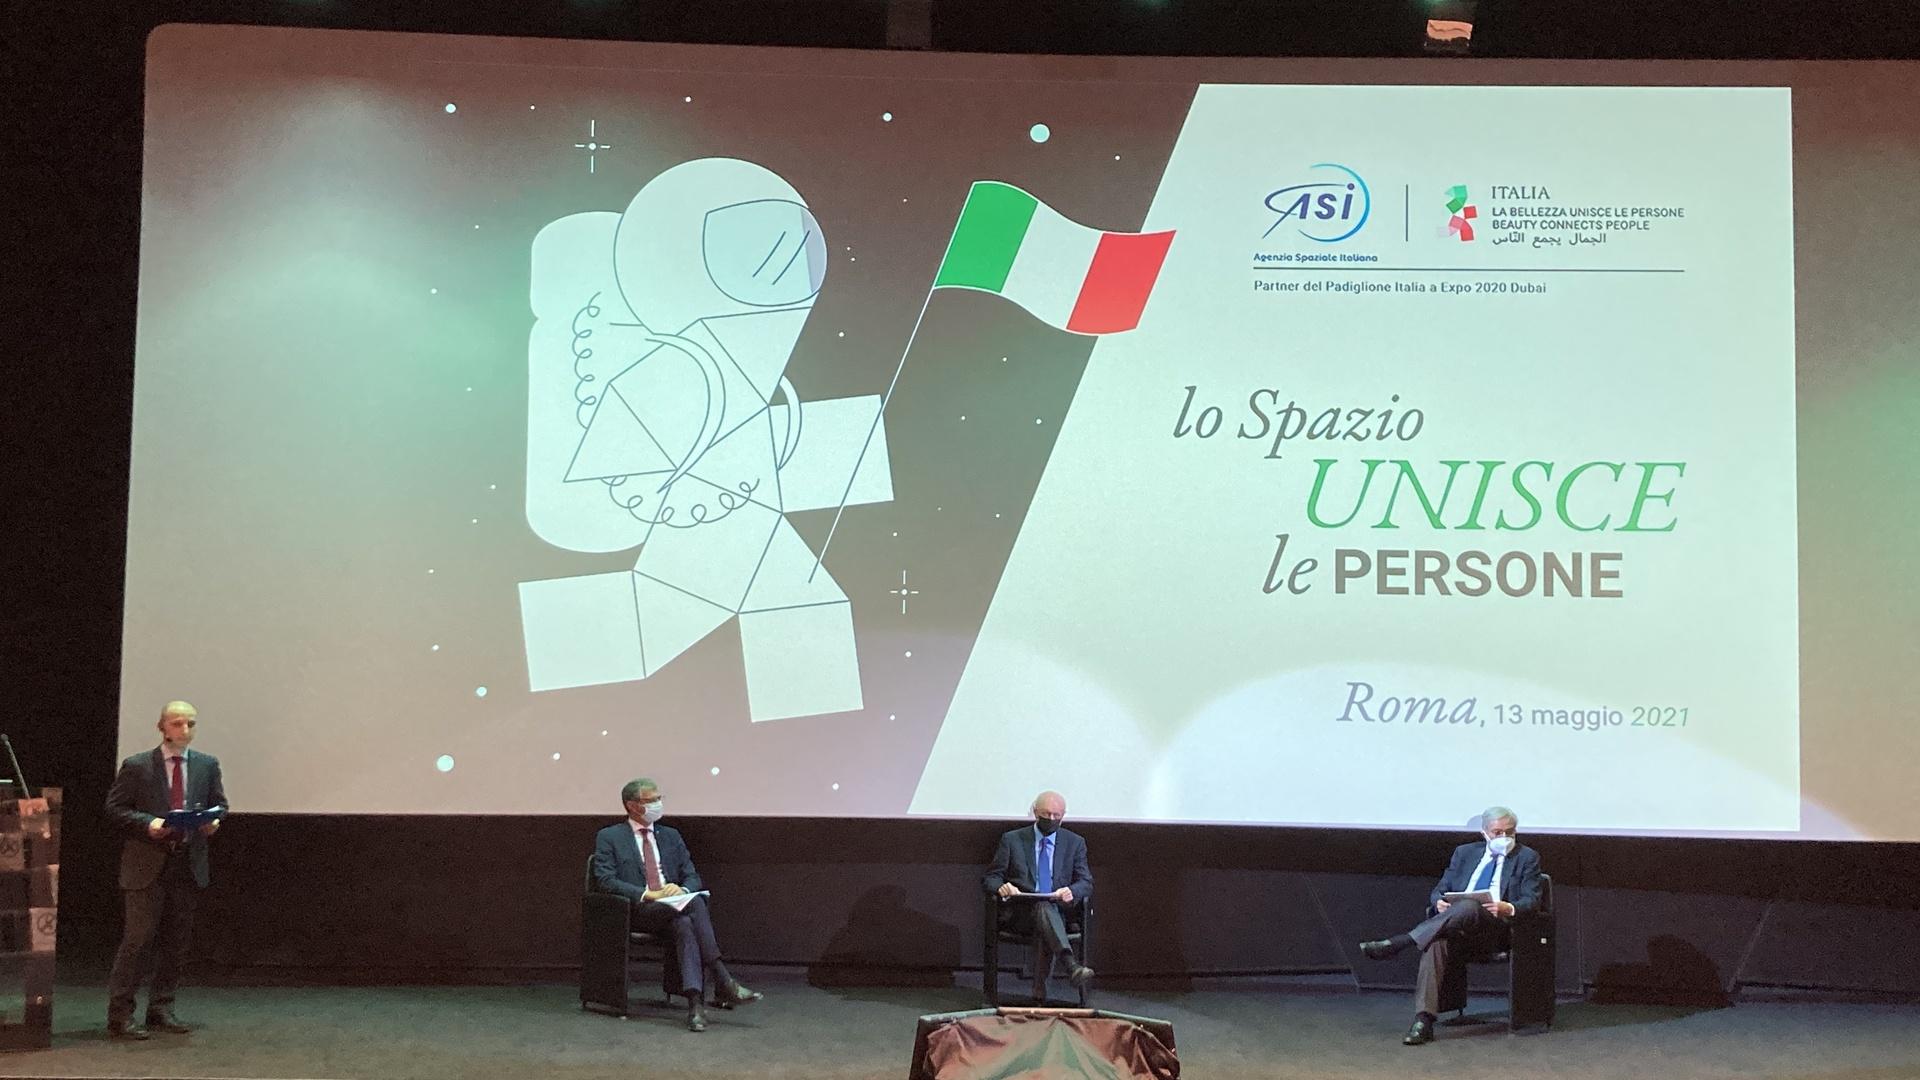 ASI - EXPO 2020 DUBAI: THE MEMORANDUM OF UNDERSTANDING BETWEEN THE ITALIAN PAVILION AND THE ITALIAN SPACE AGENCY HAS BEEN PRESENTED